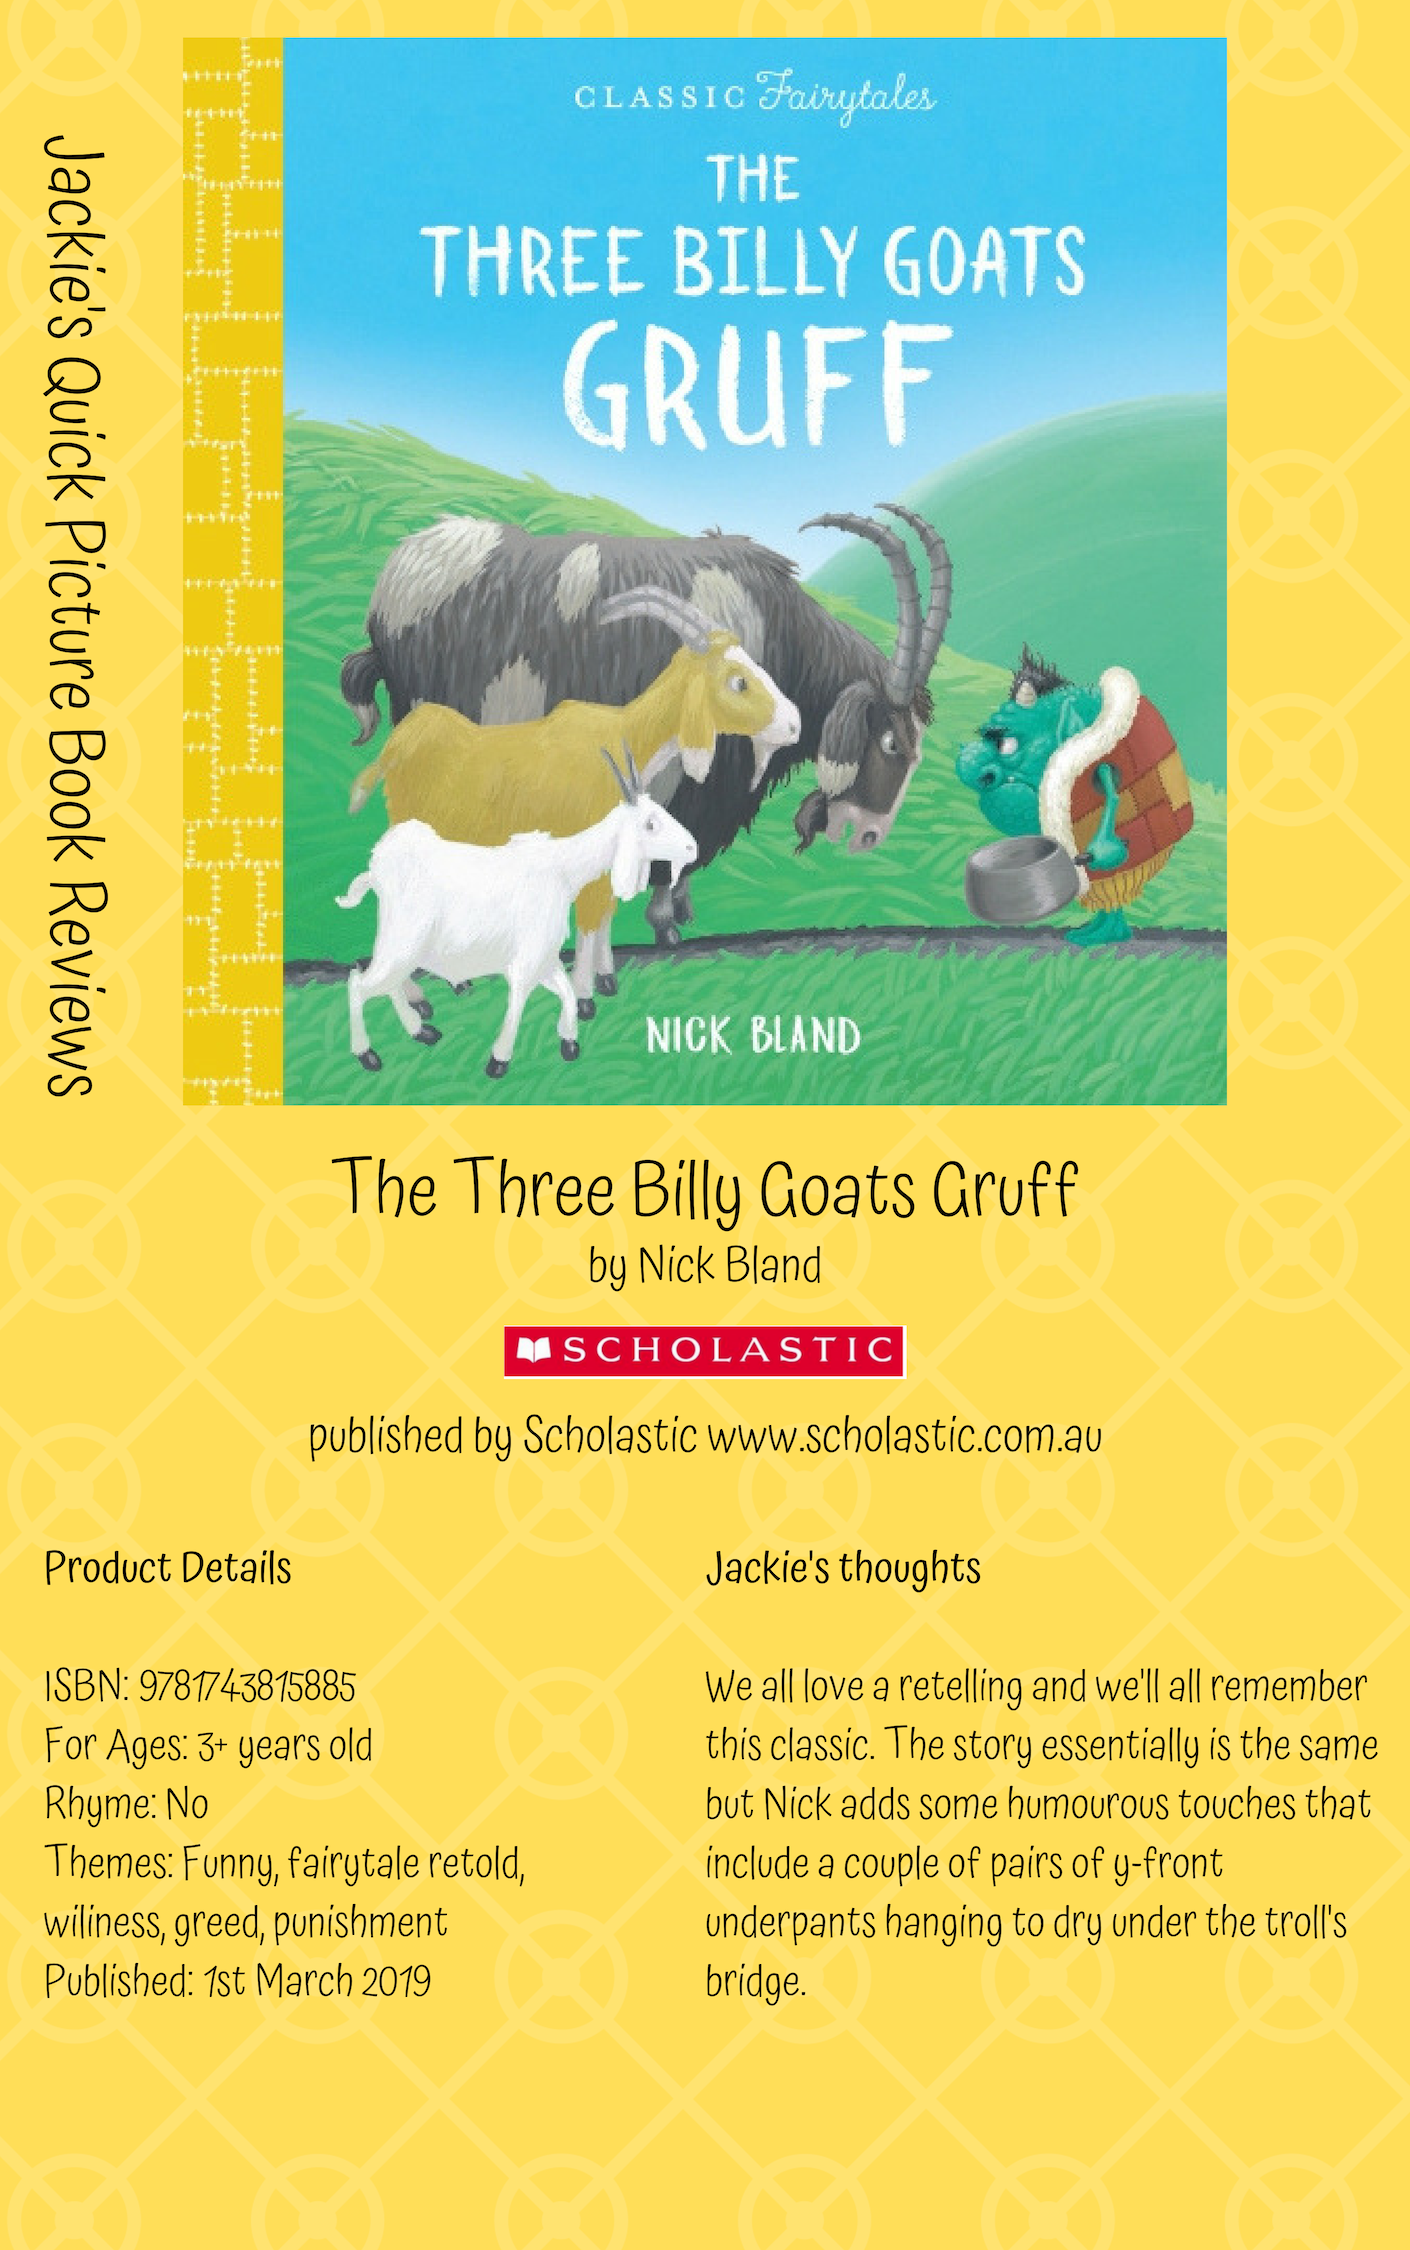 S billy goats gruff